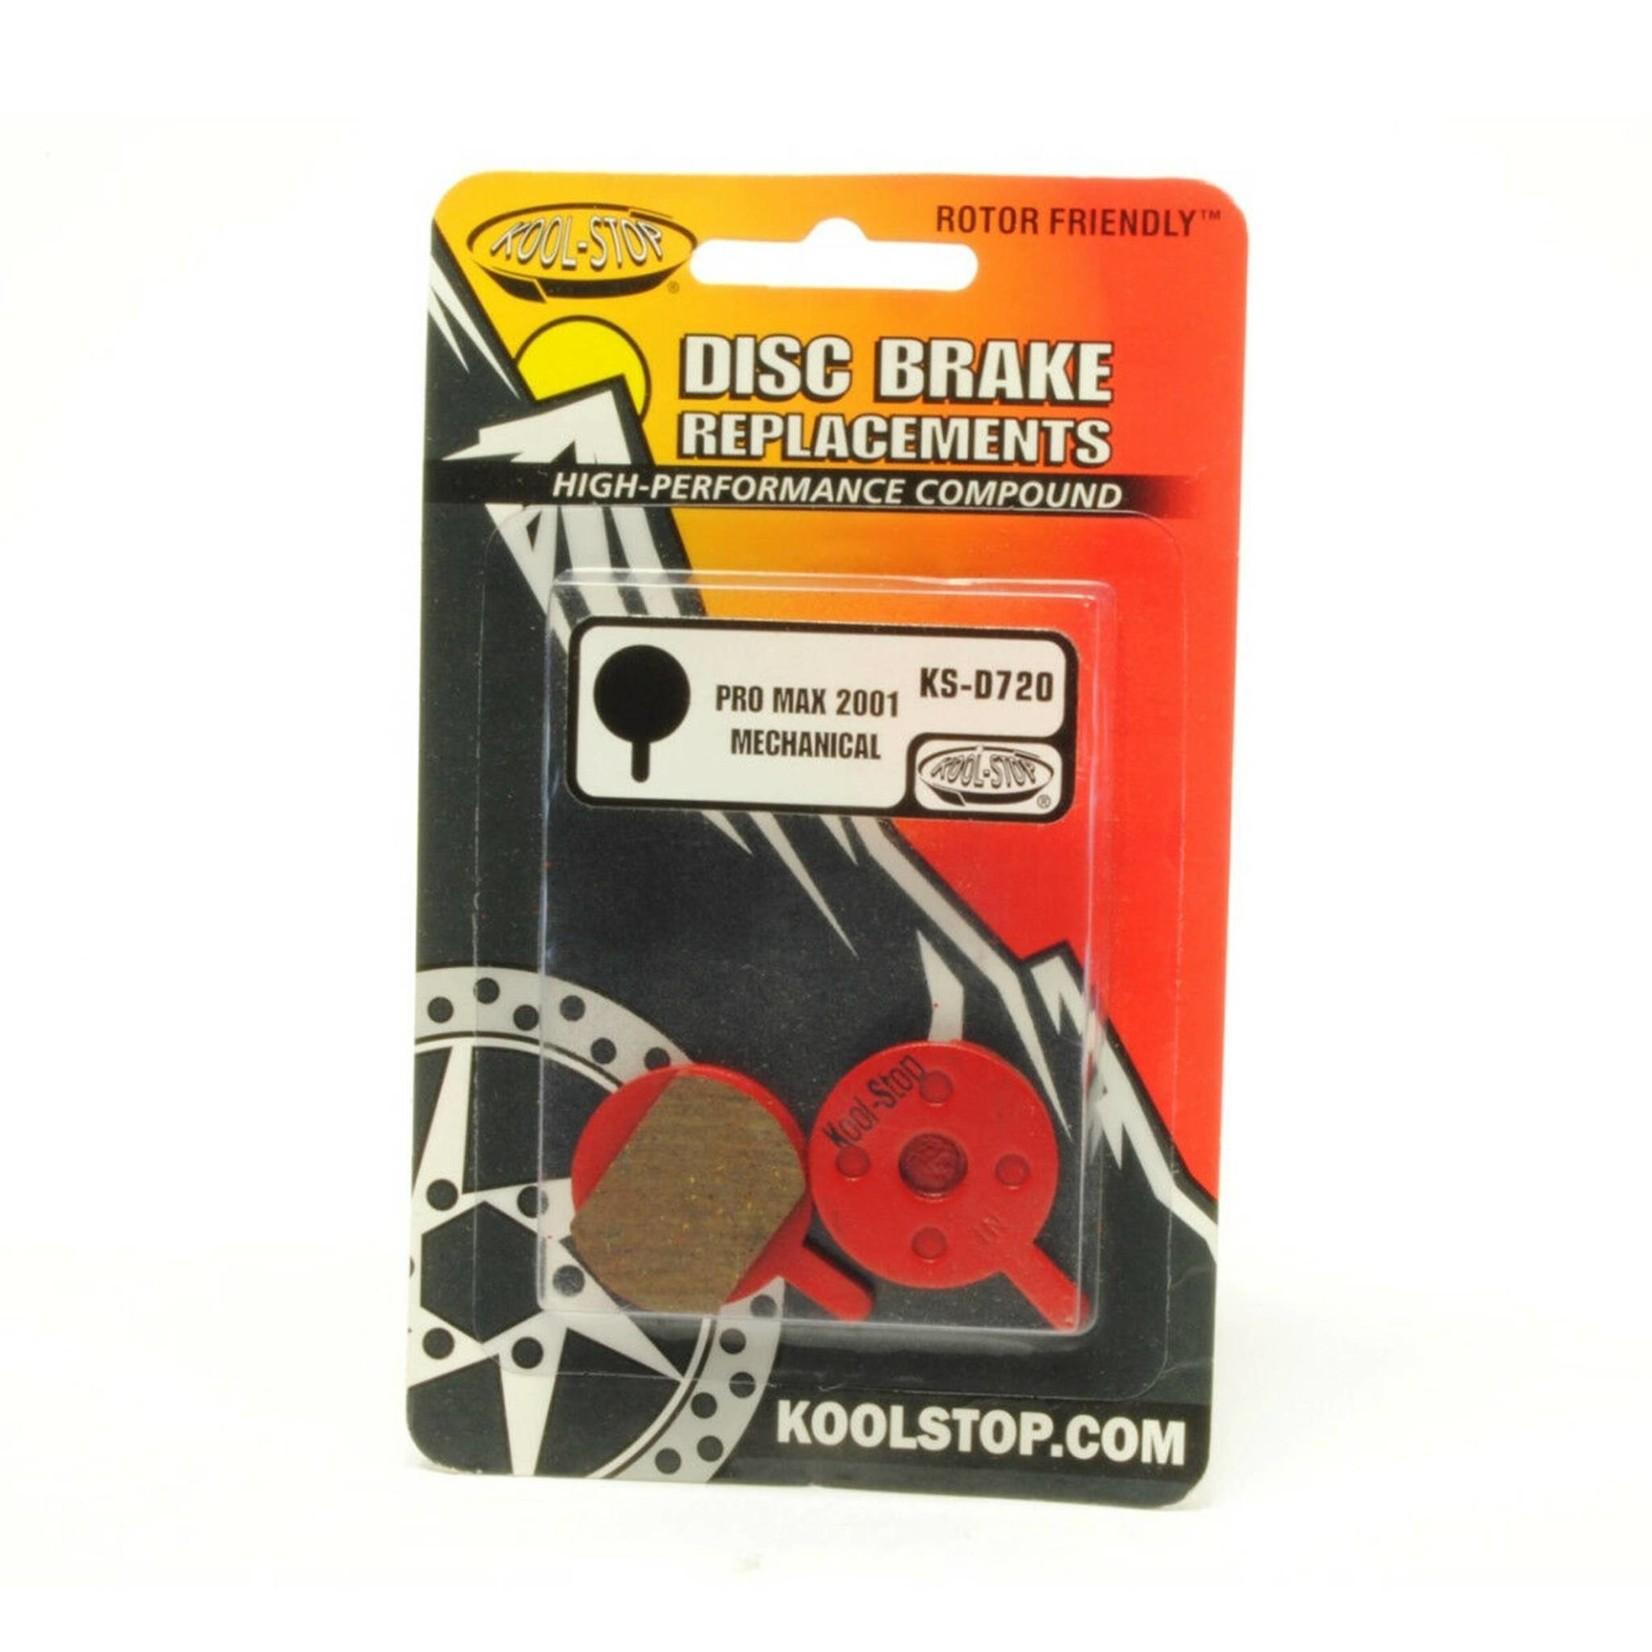 Koolstop Promax Mech KS-D720 Disc Pads